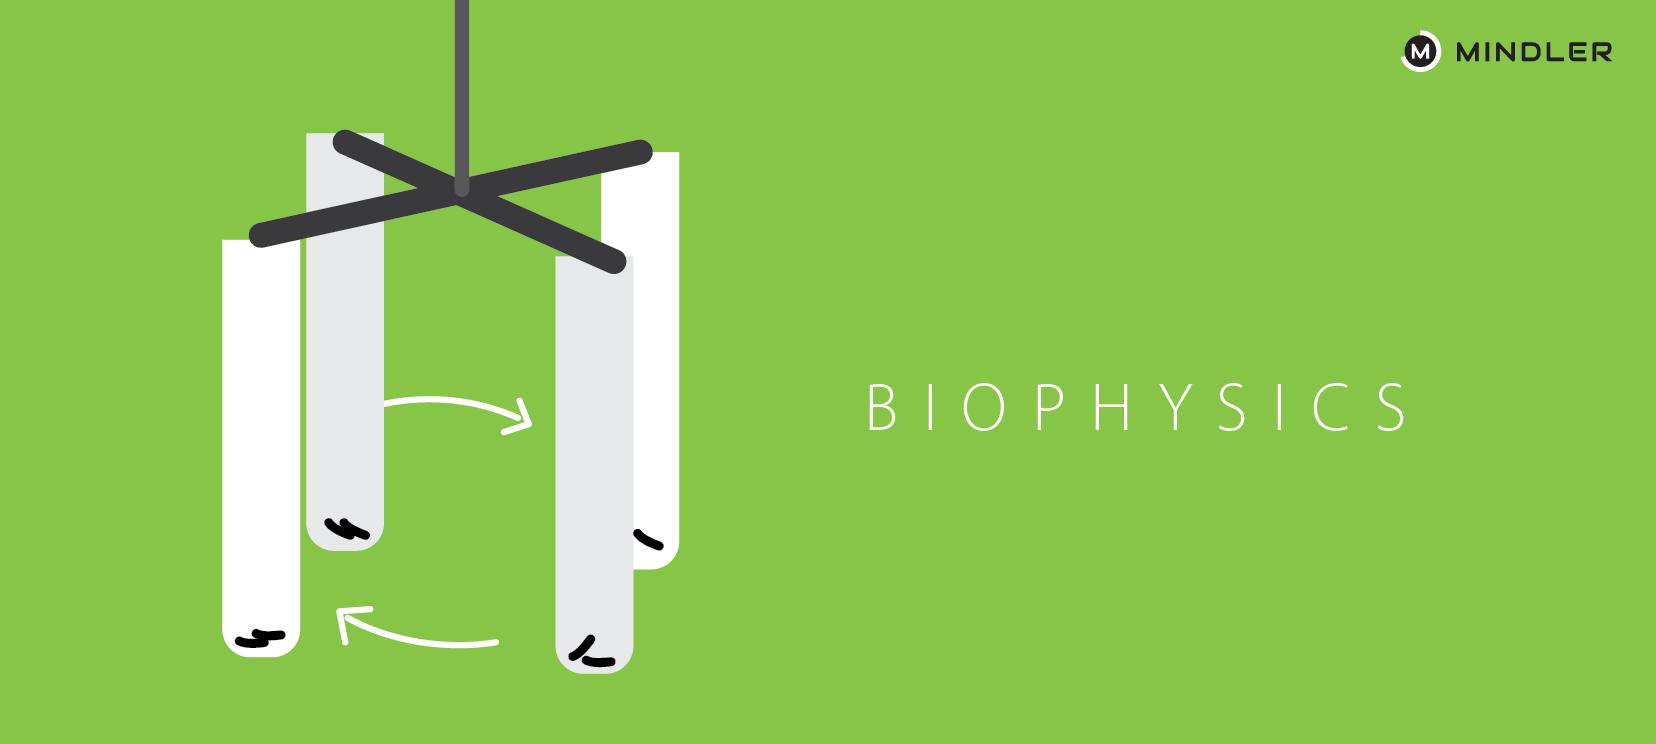 biophysics-career-in-india